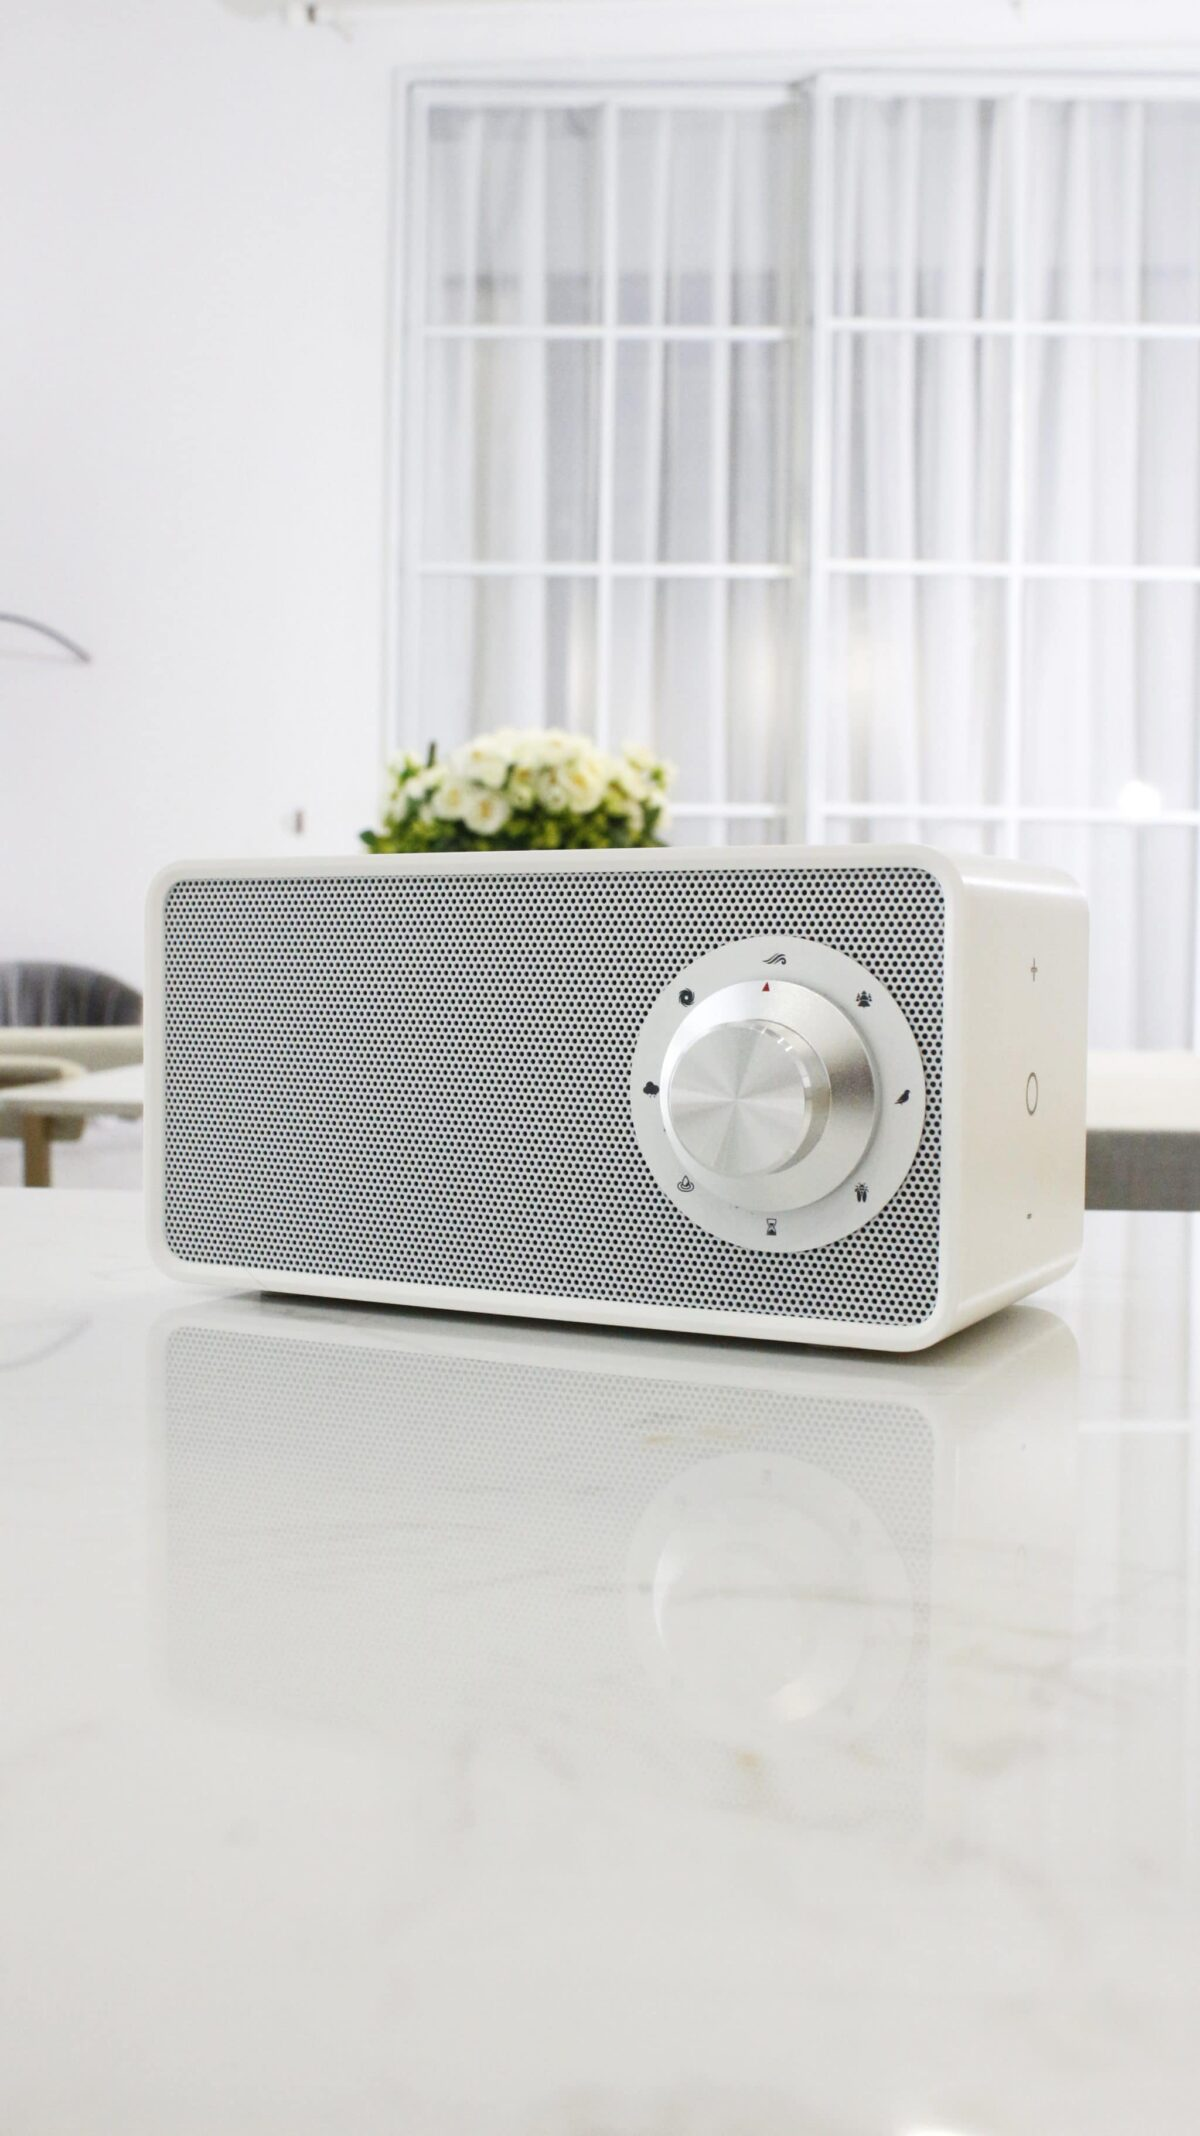 Speaker & draadloos lader white noise sfeer2 - Yipp & Co